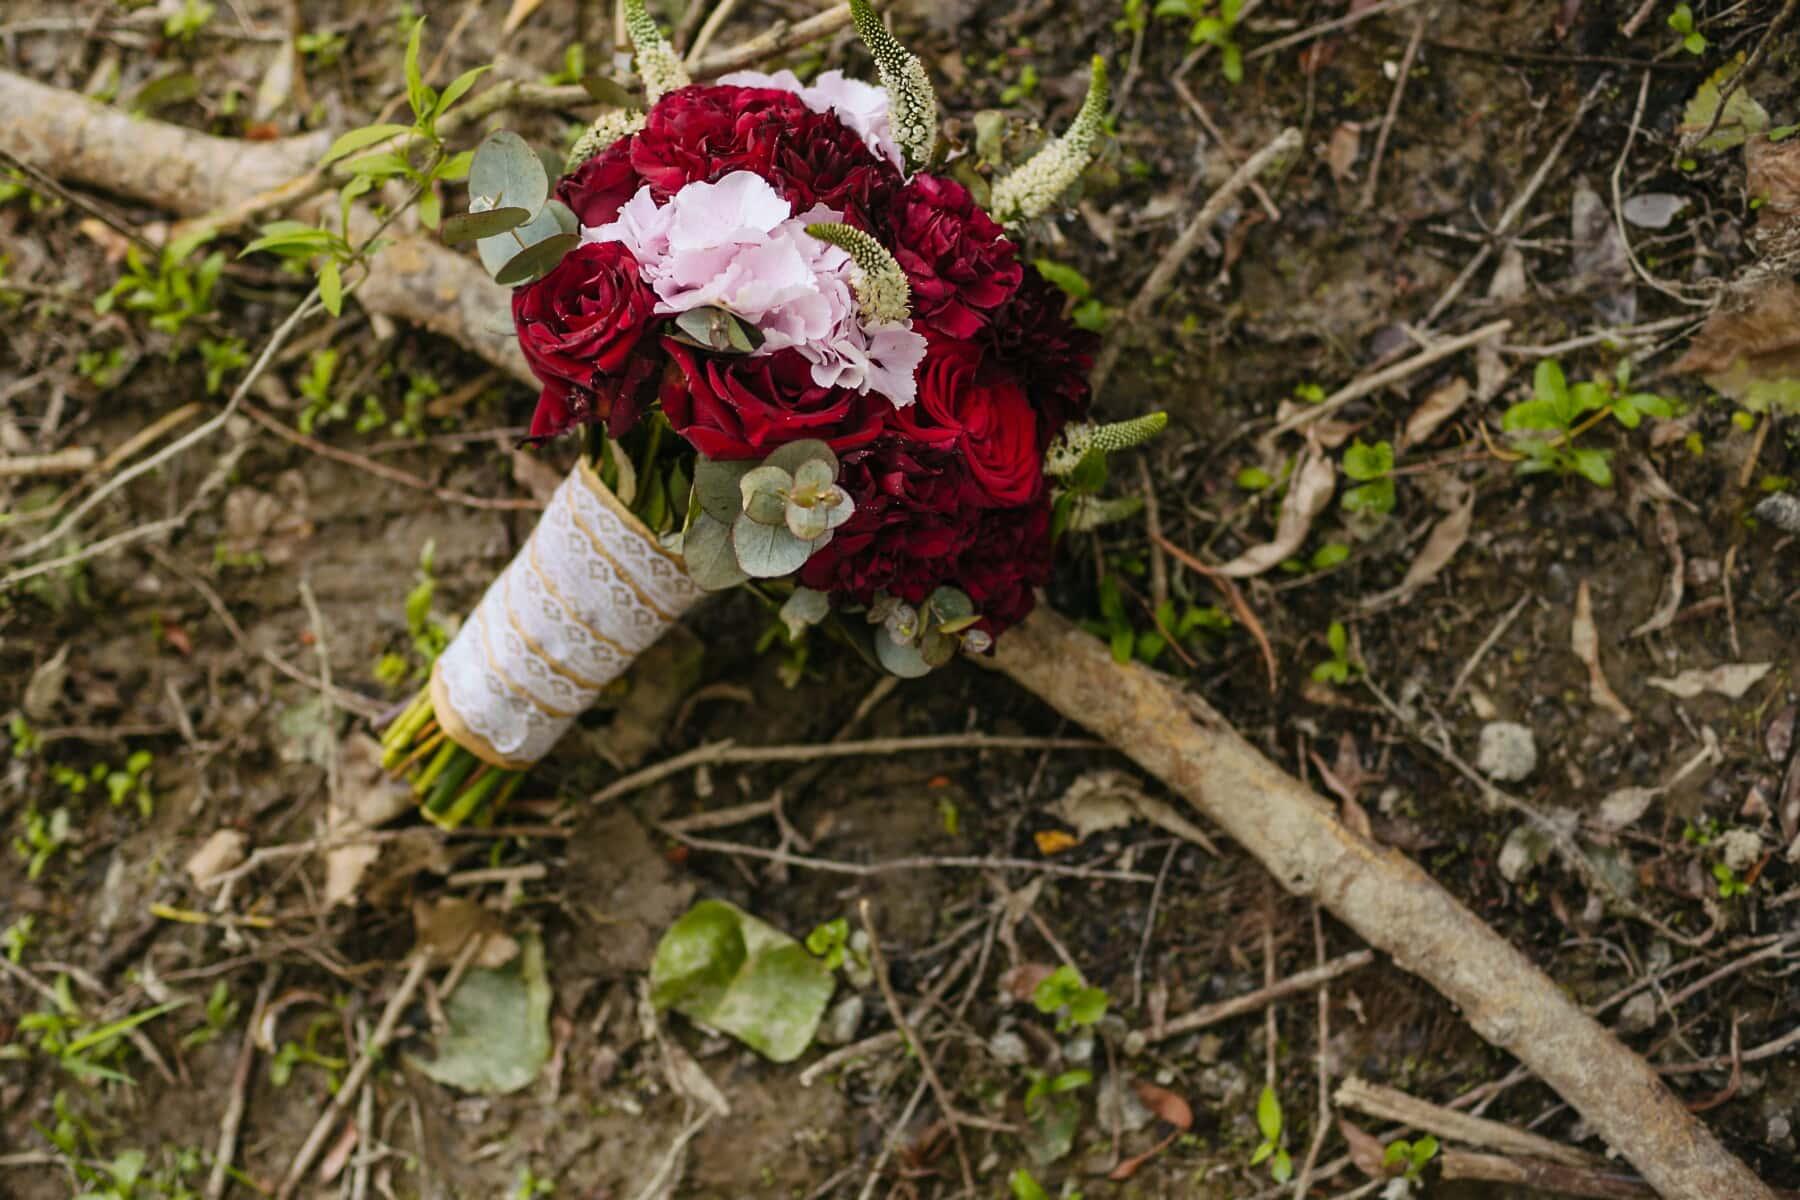 wedding bouquet, pinkish, red, pastel, roses, leaf, flower, nature, flora, rose